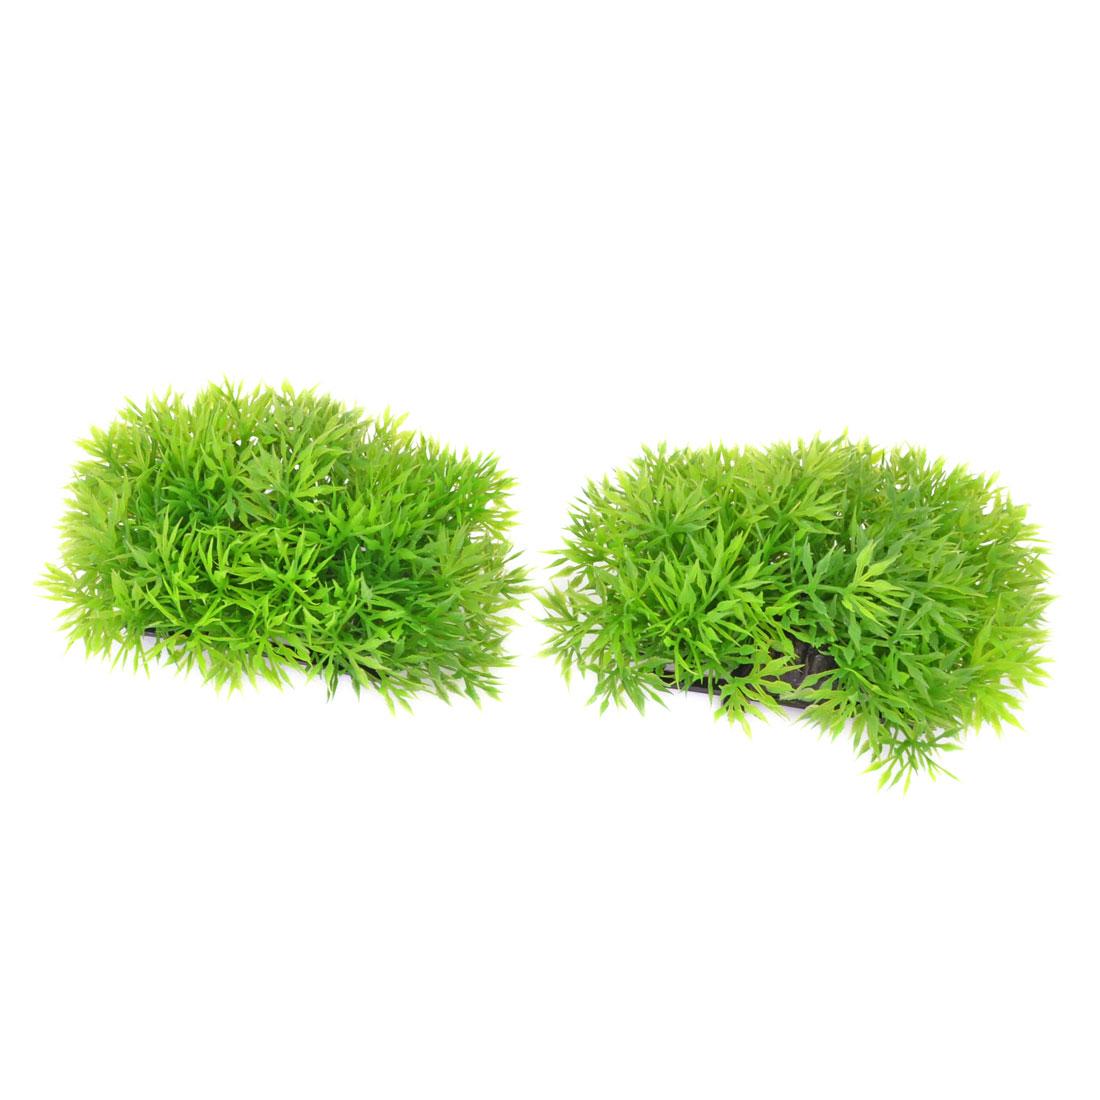 Aquarium Landscaping Manmade Plastic Lawn Plants Decor Green 2 Pcs